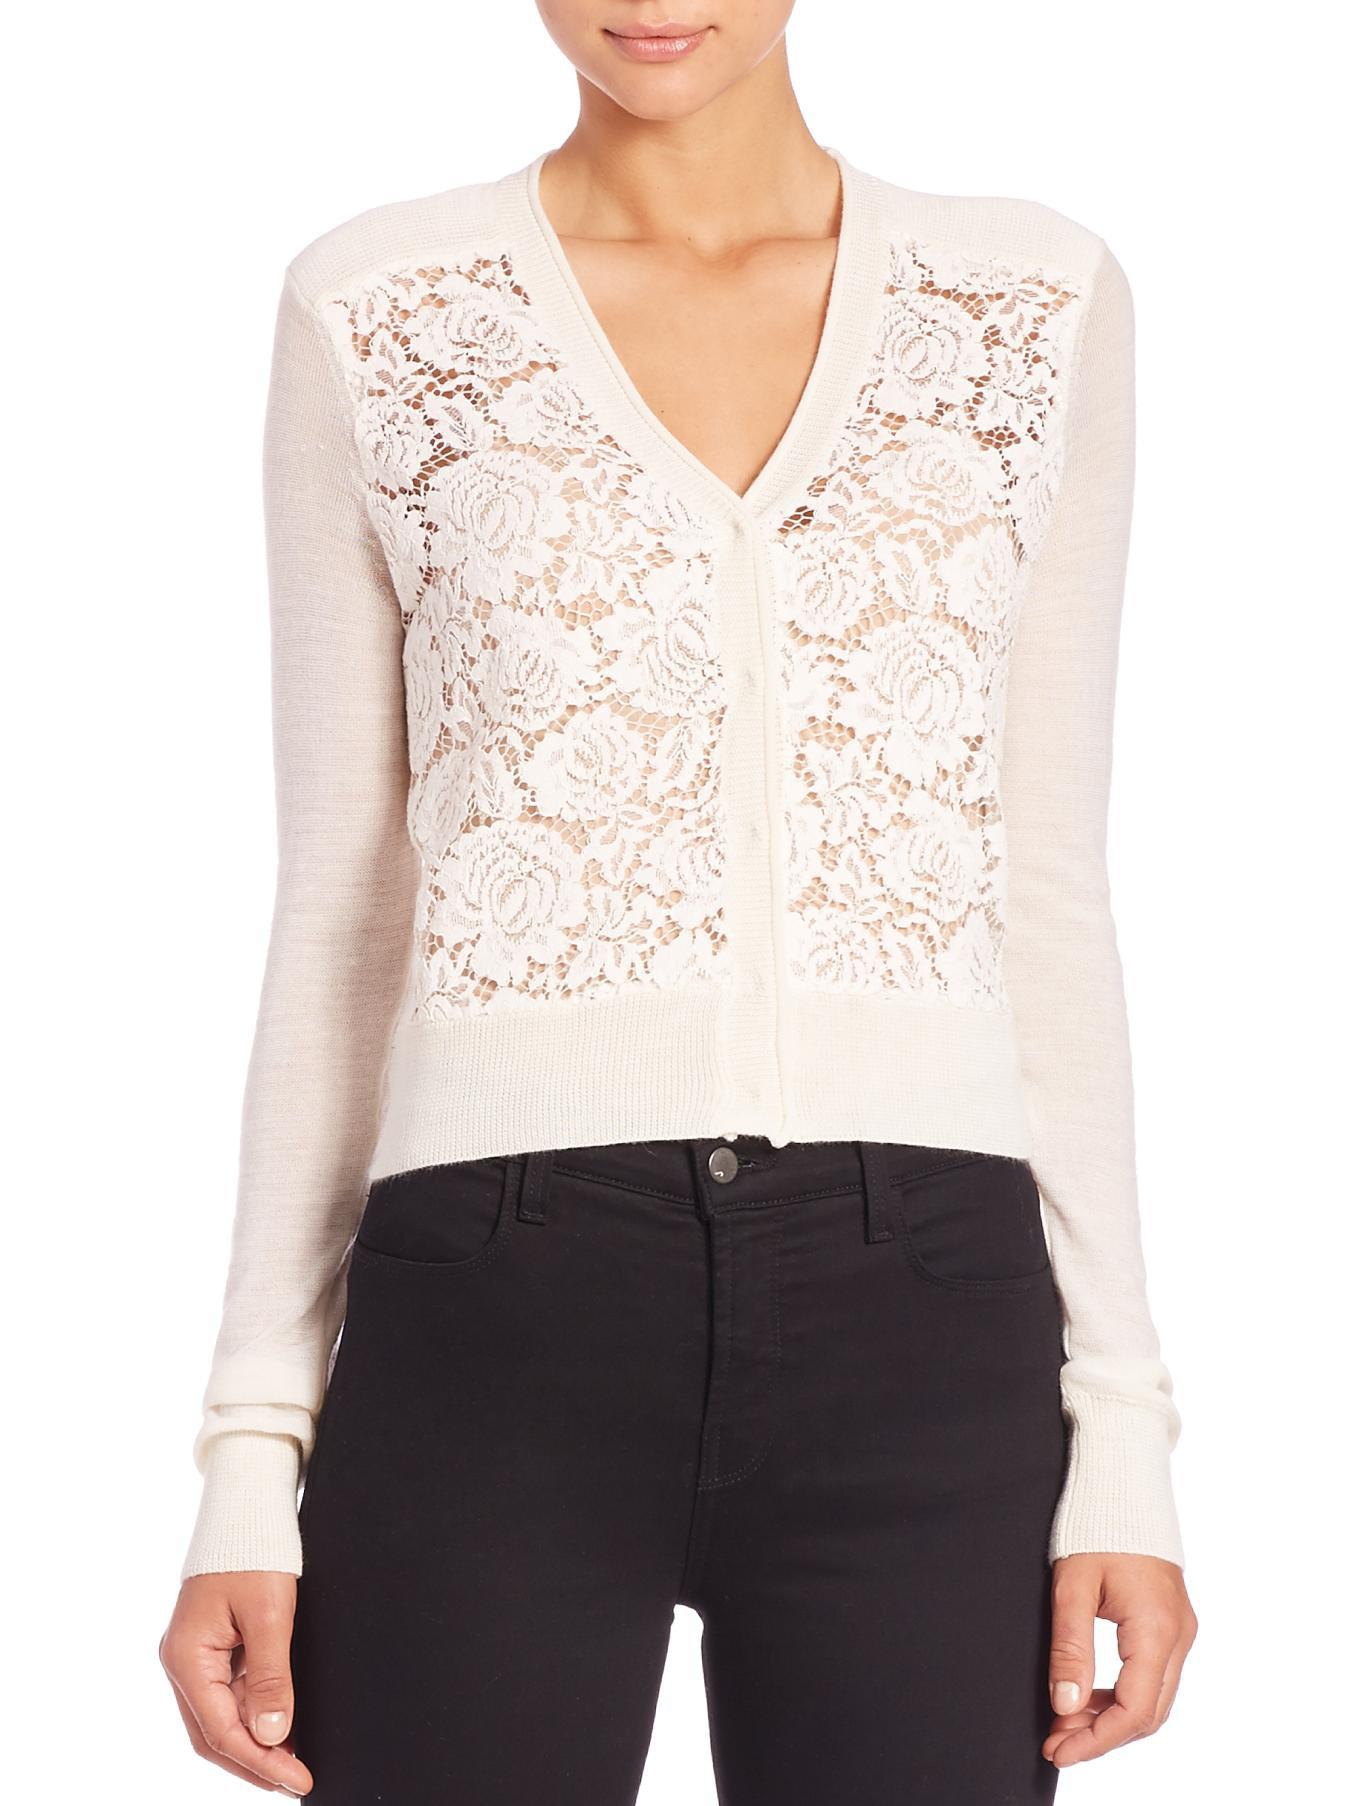 Lyst - Rebecca Taylor Lace-front Cardigan Sweater in White e013c94e2